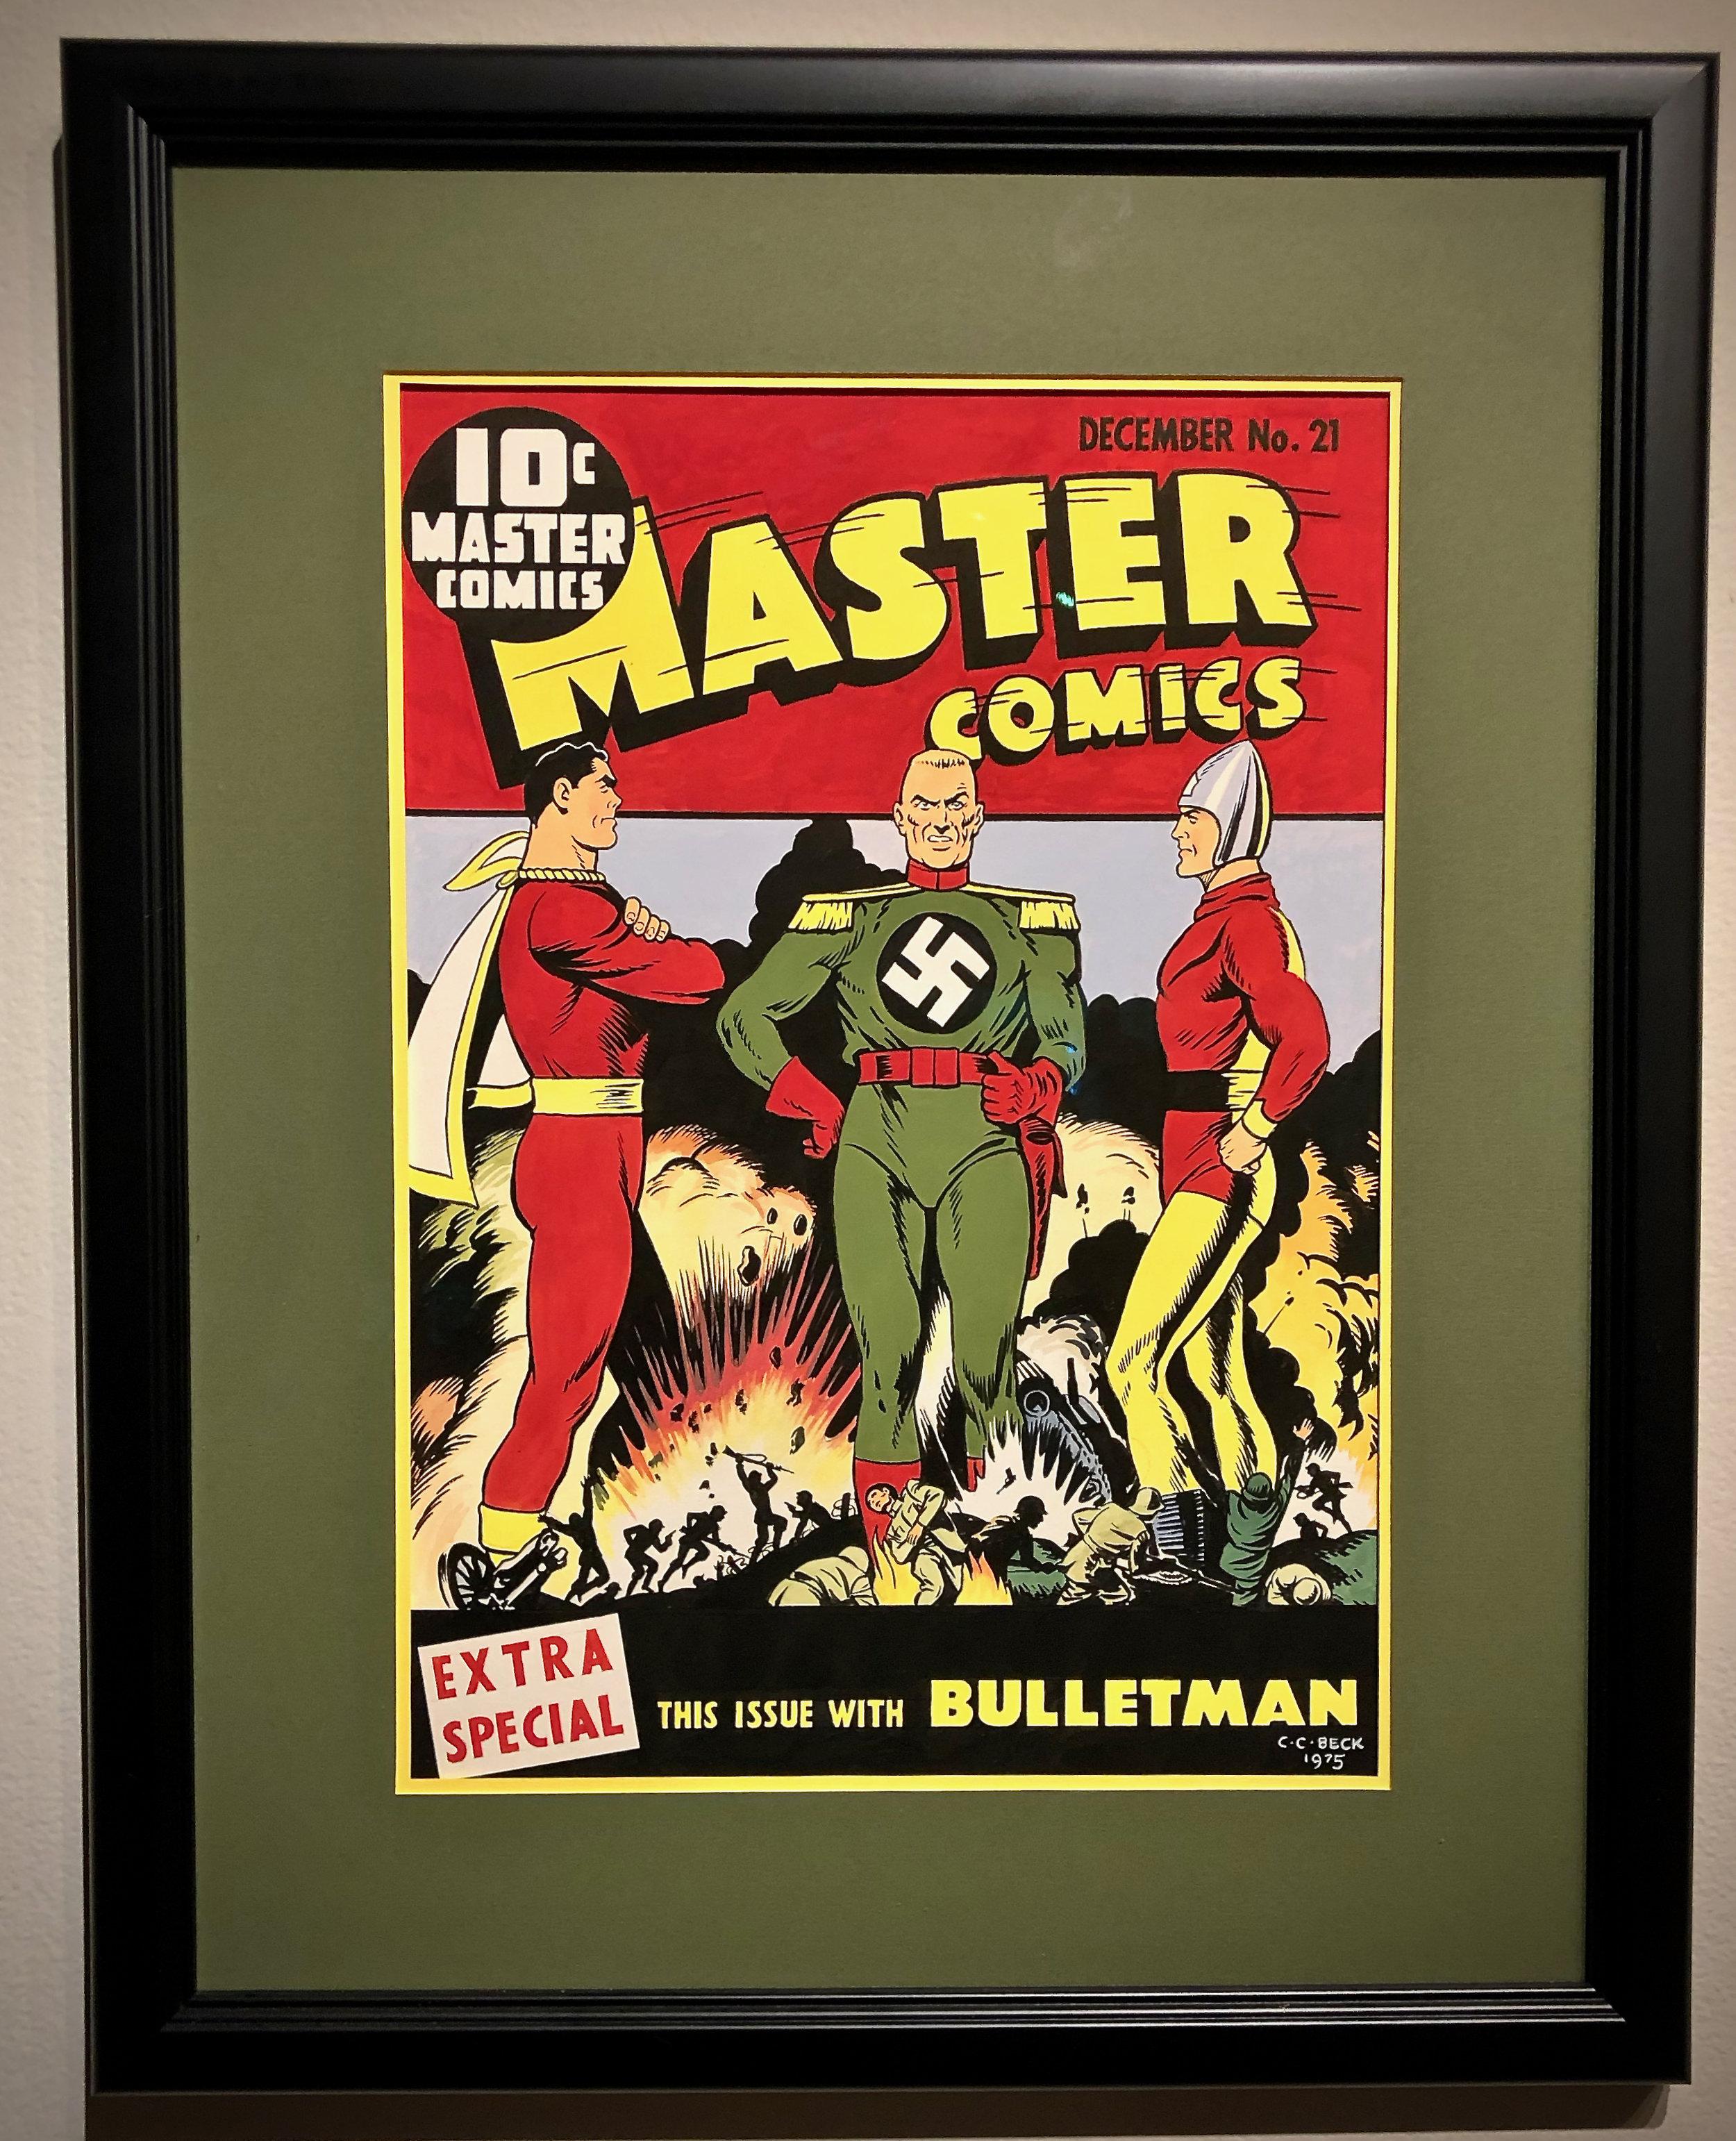 Captain Marvel, Captain Nazi and Bulletman // Henry J